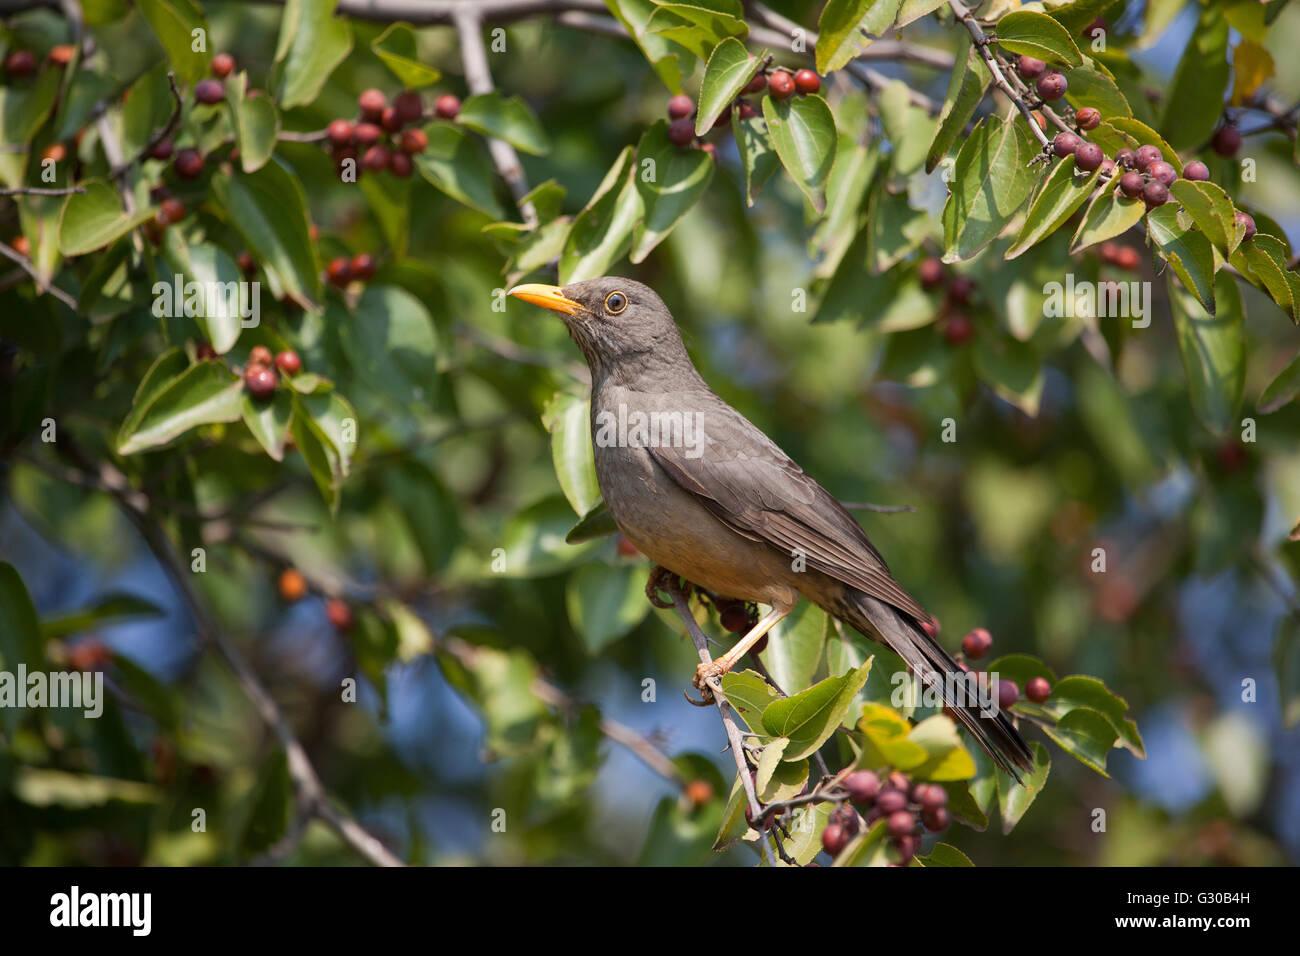 Olive Thrush sitting in tree Stock Photo